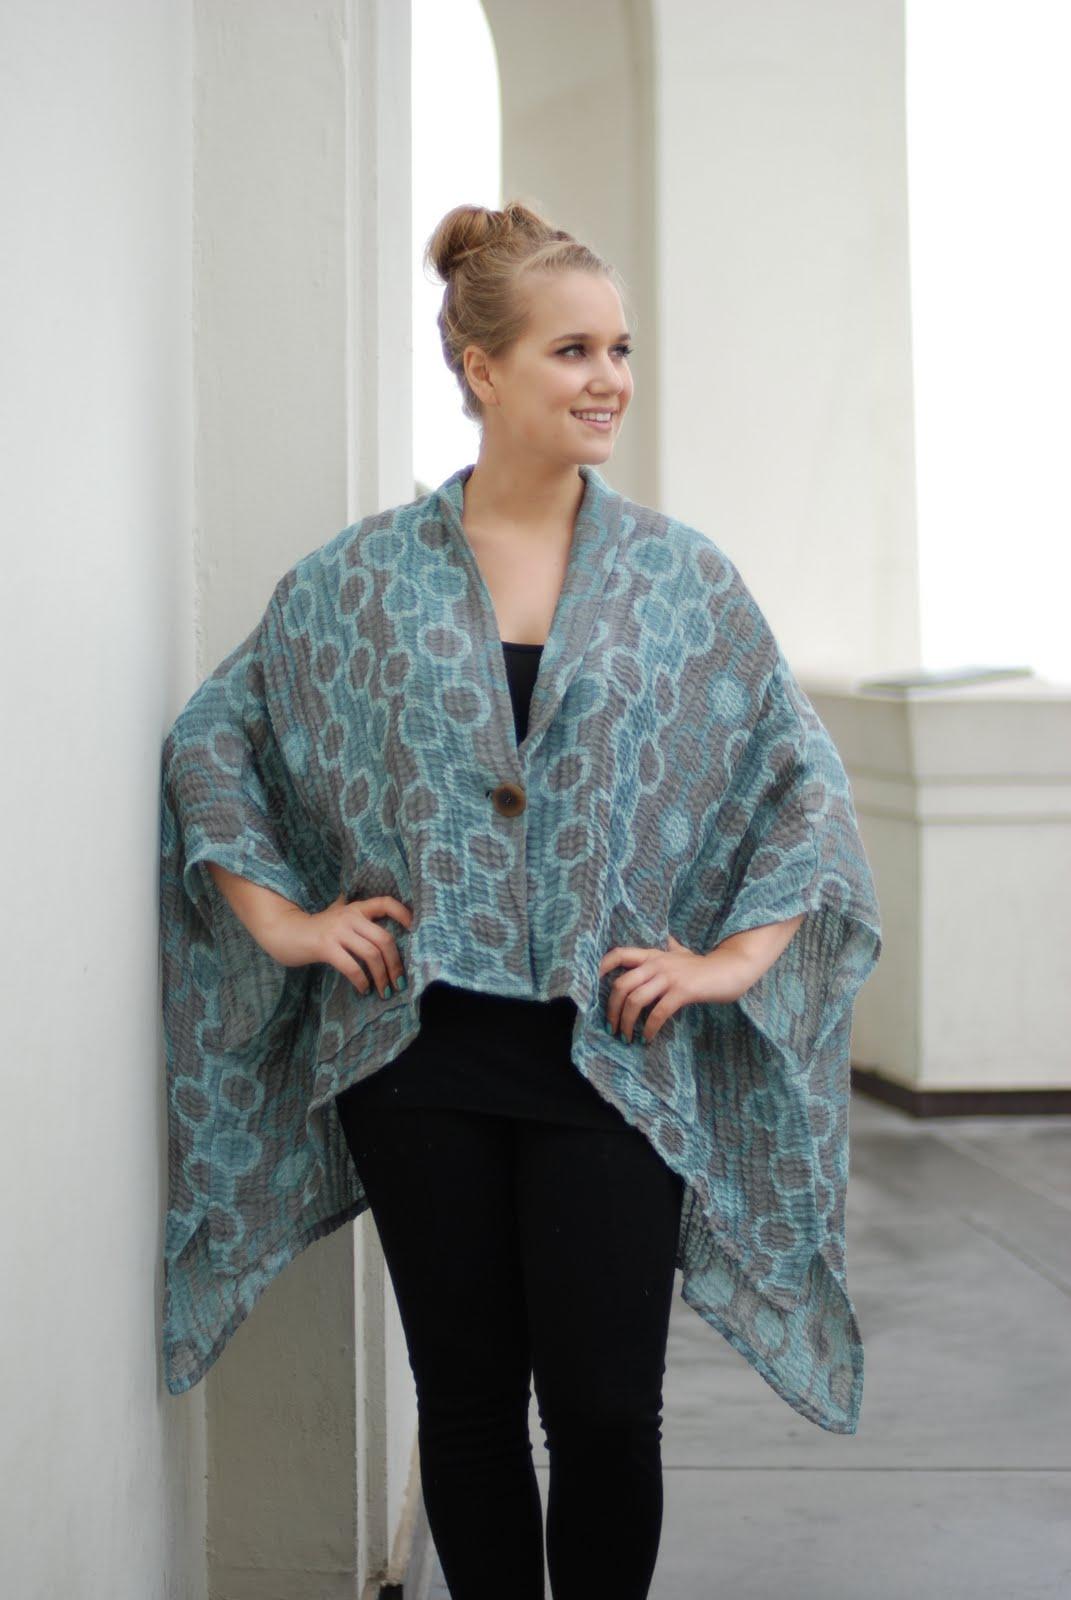 Transparente Designs European Designer Plus Size Fashion